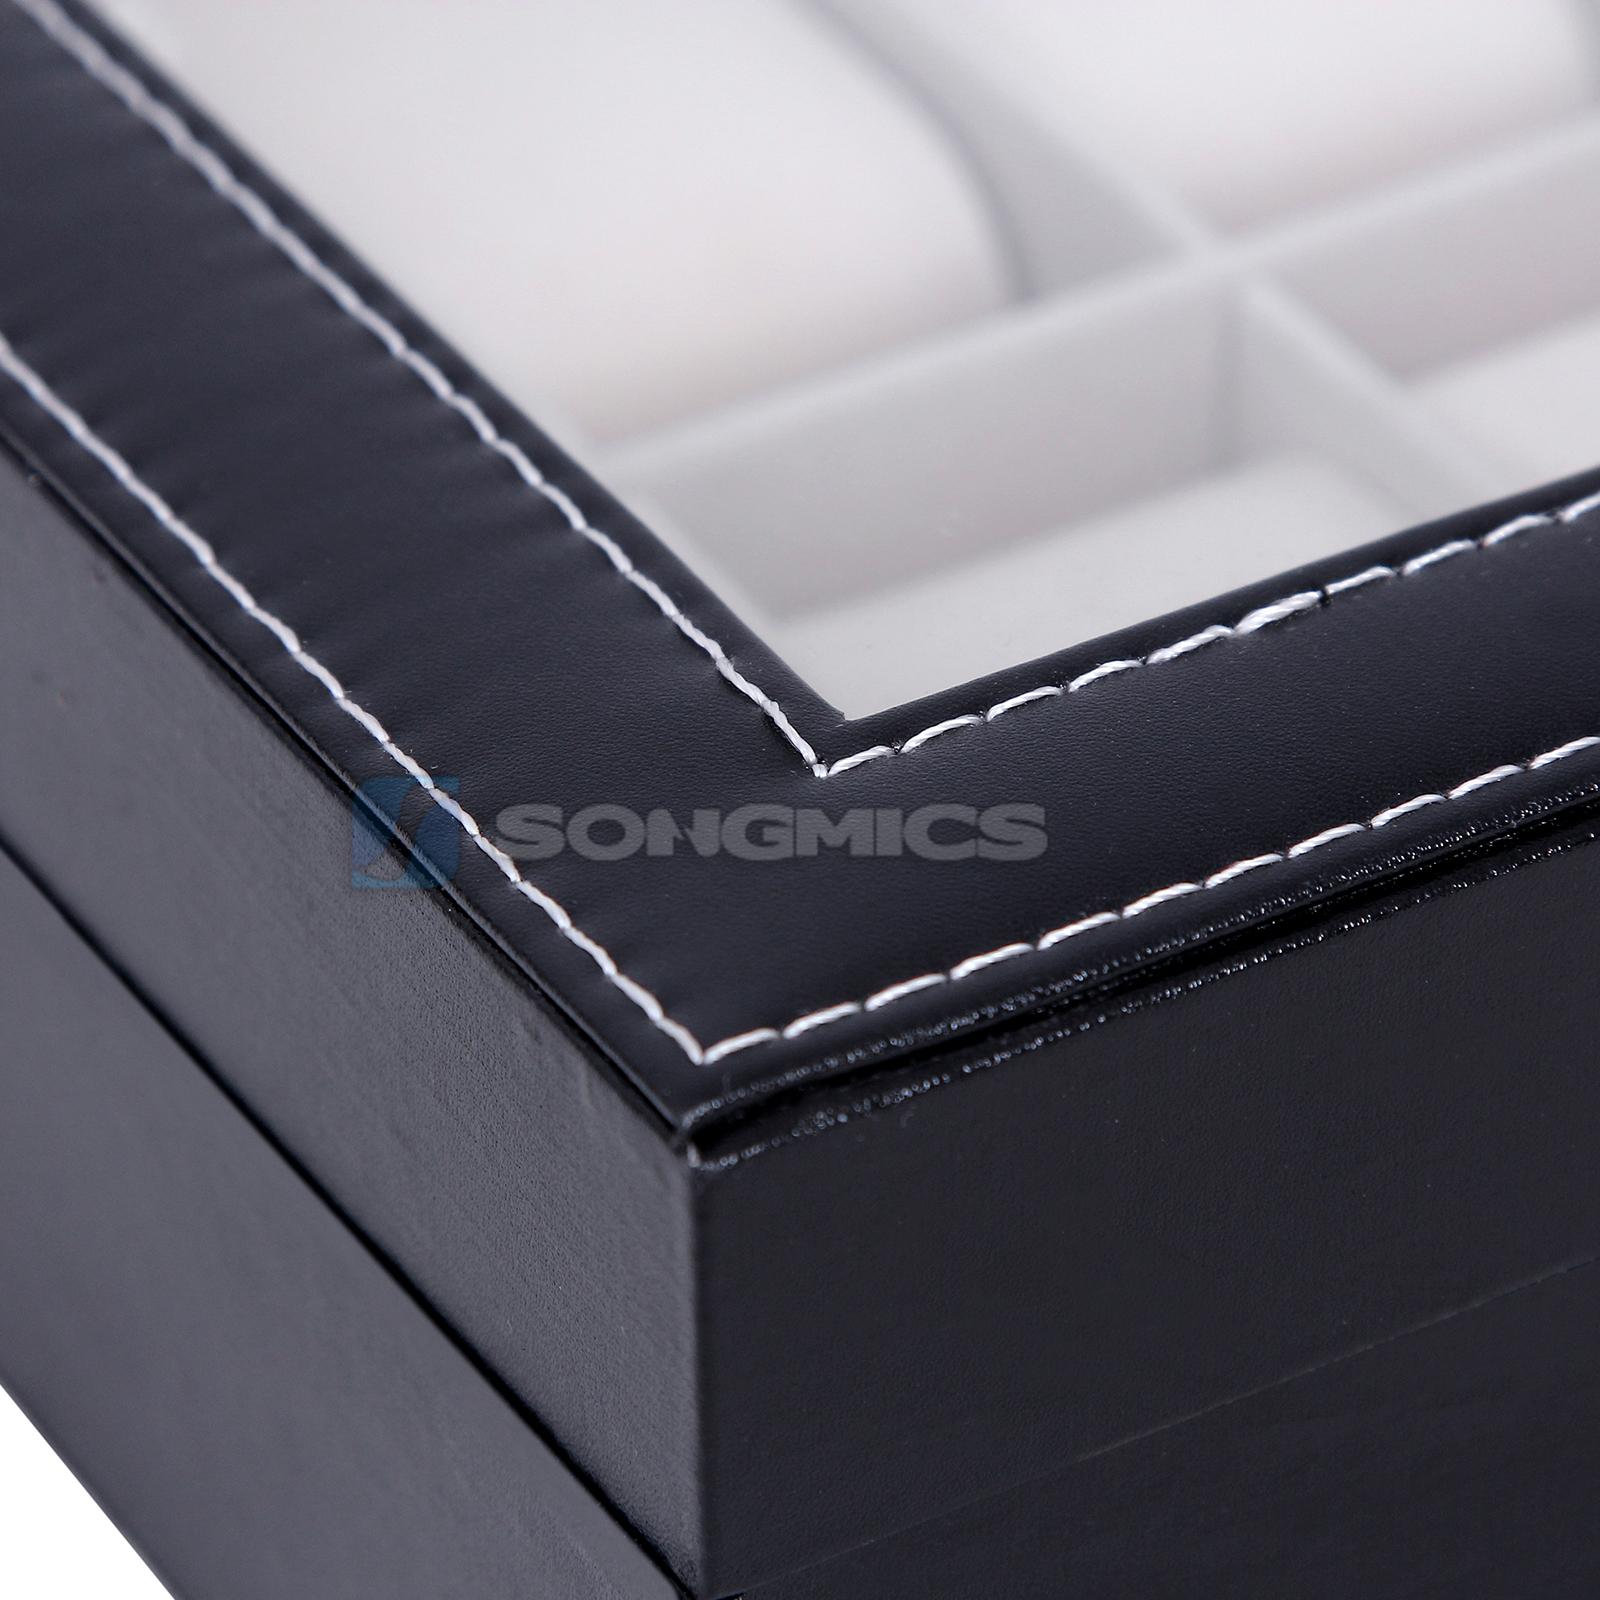 songmics scatola porta orologi box o custodia per 10 orologi jwb010 ebay. Black Bedroom Furniture Sets. Home Design Ideas